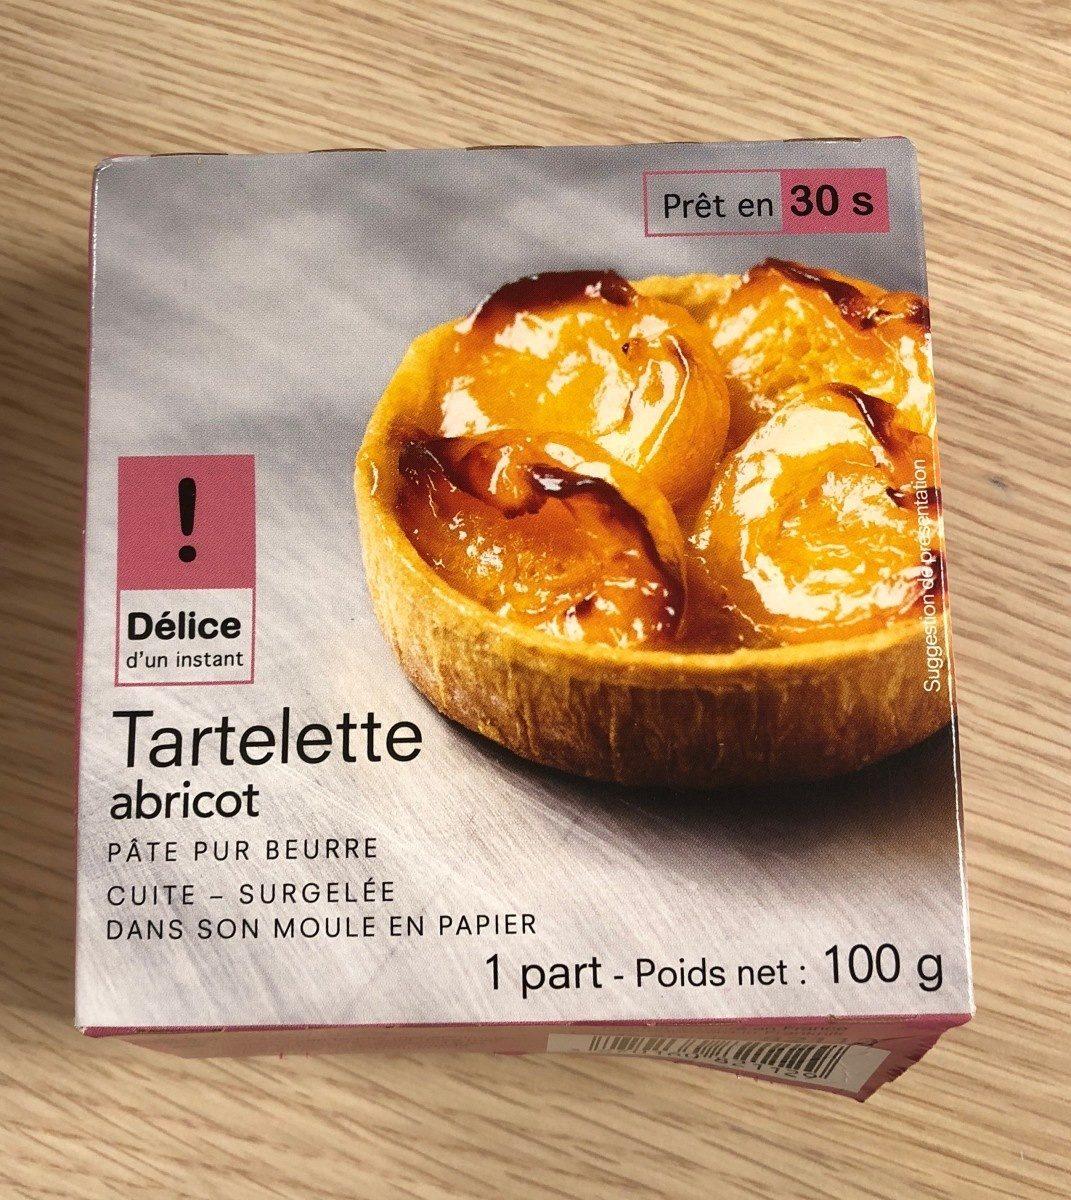 Tartelette abricot - Product - fr